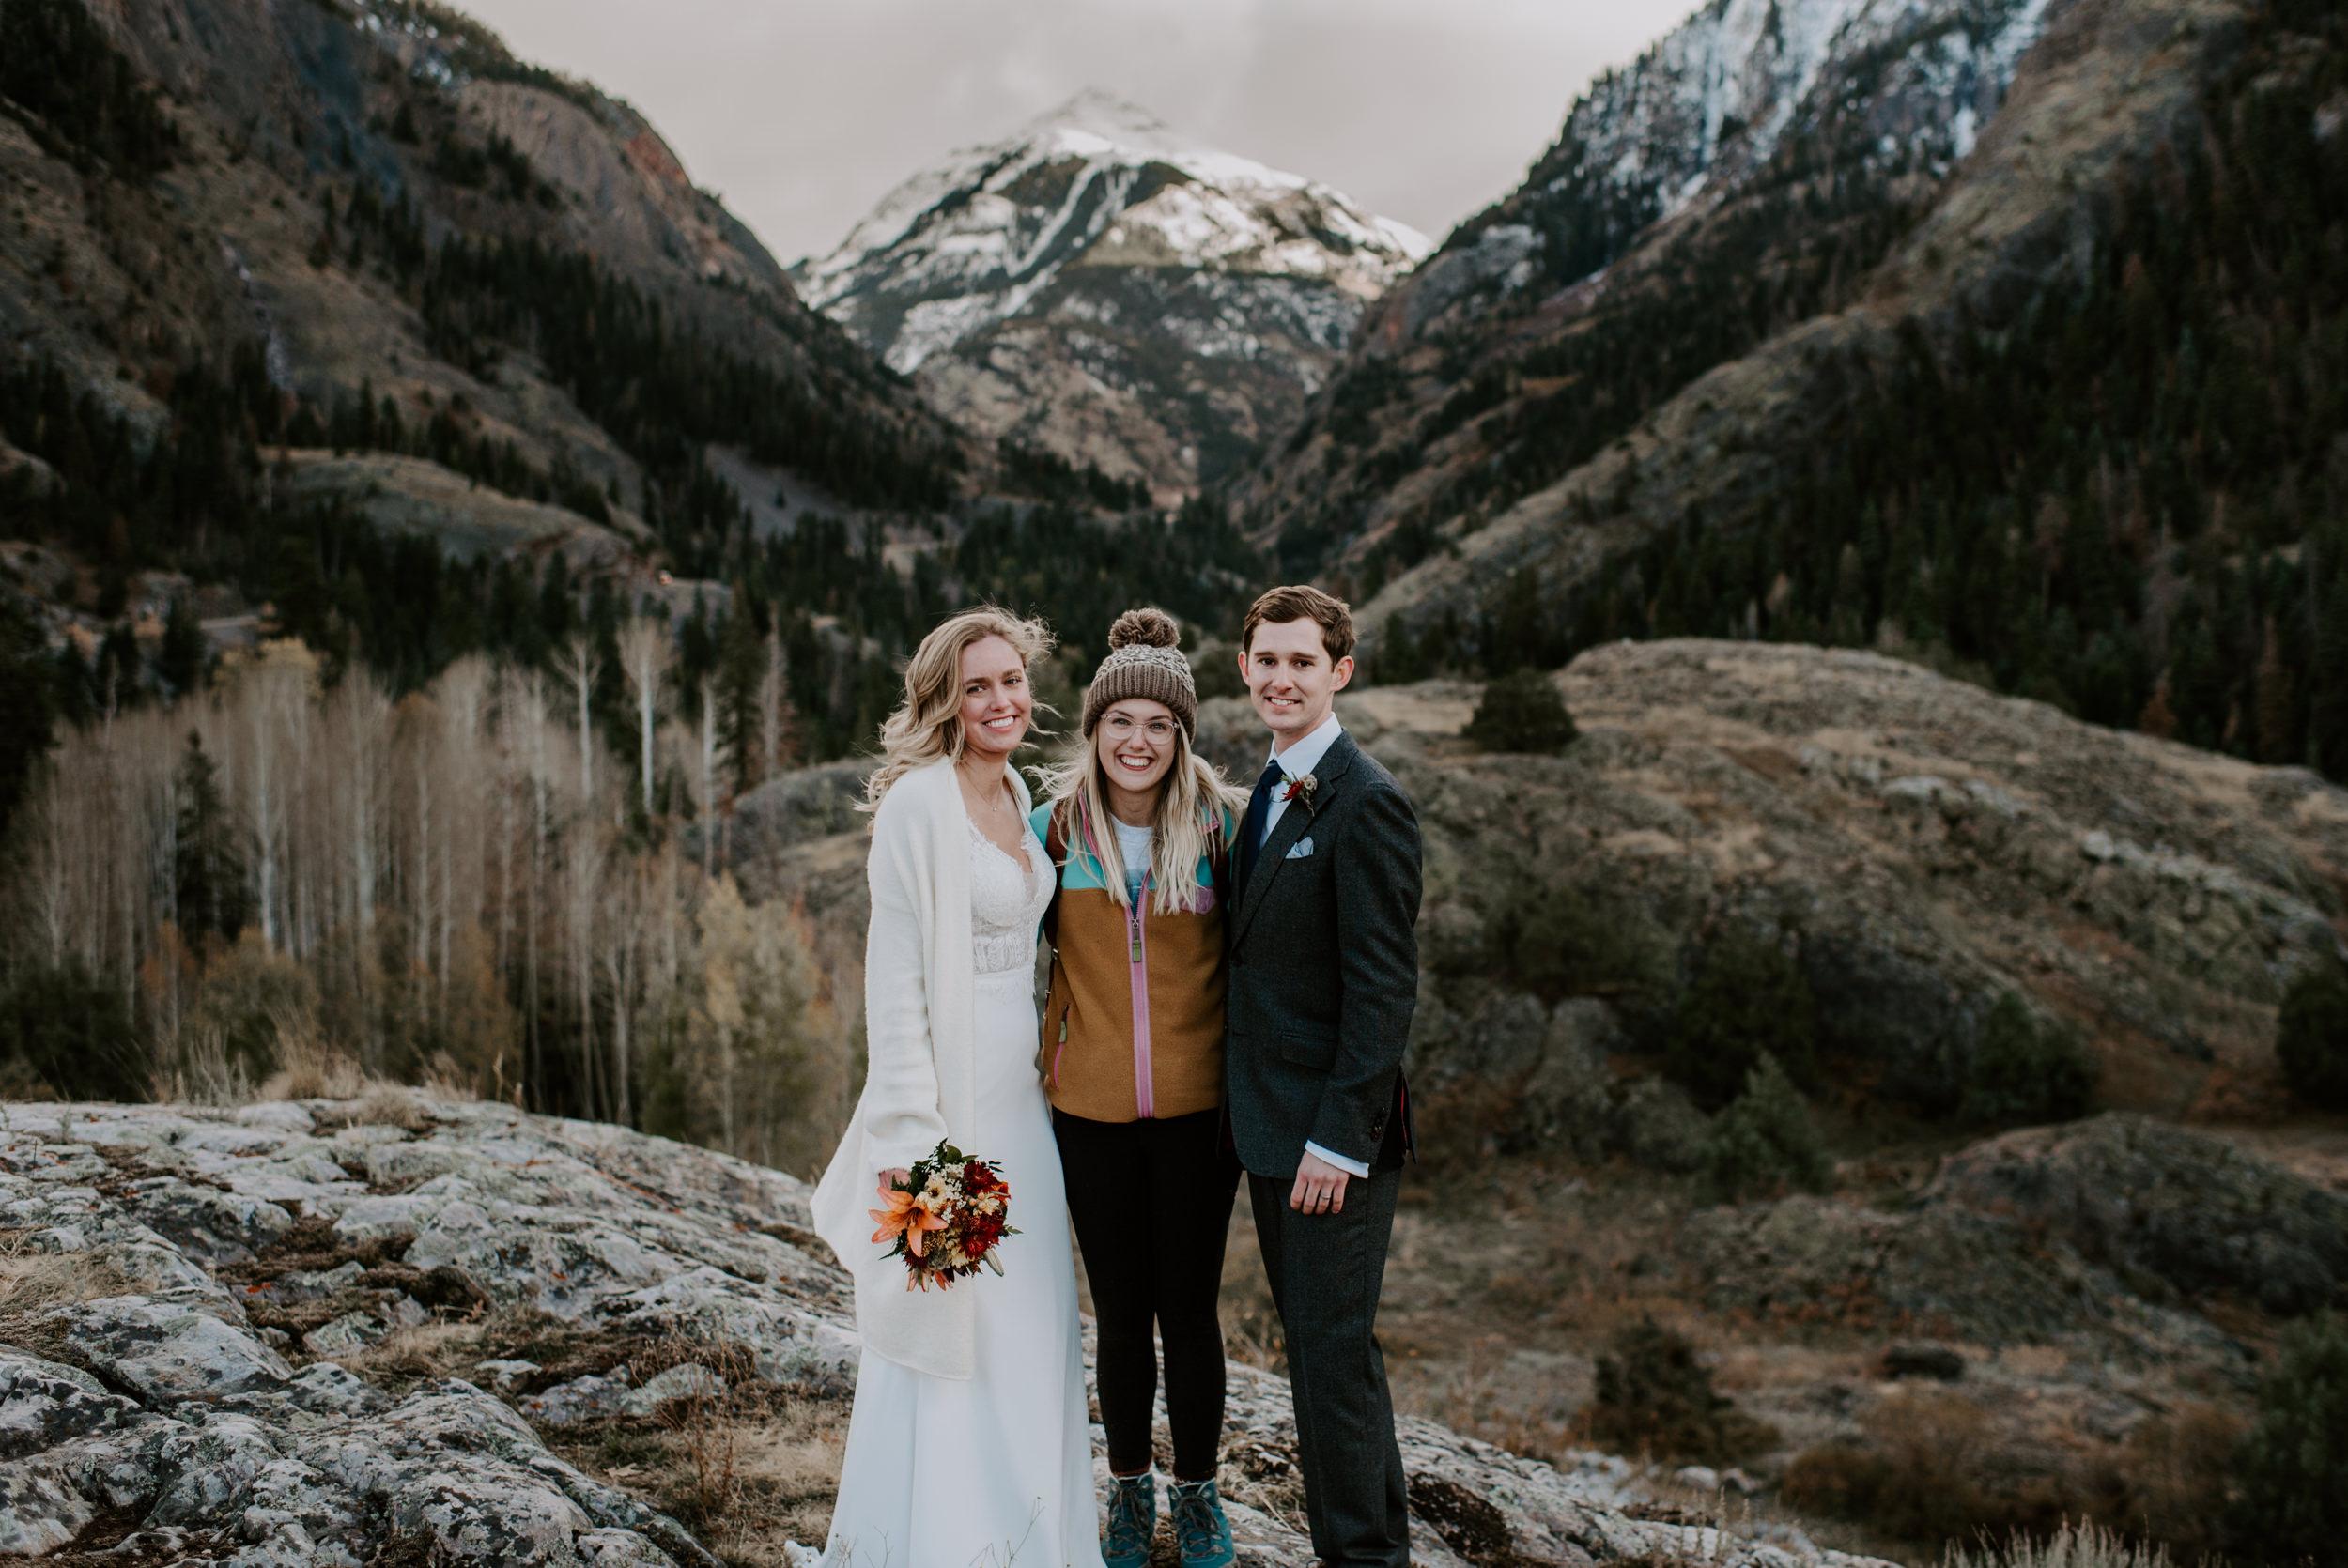 Colorado elopement photographer. Denver wedding photographer. Telluride, Colorado adventure elopement.